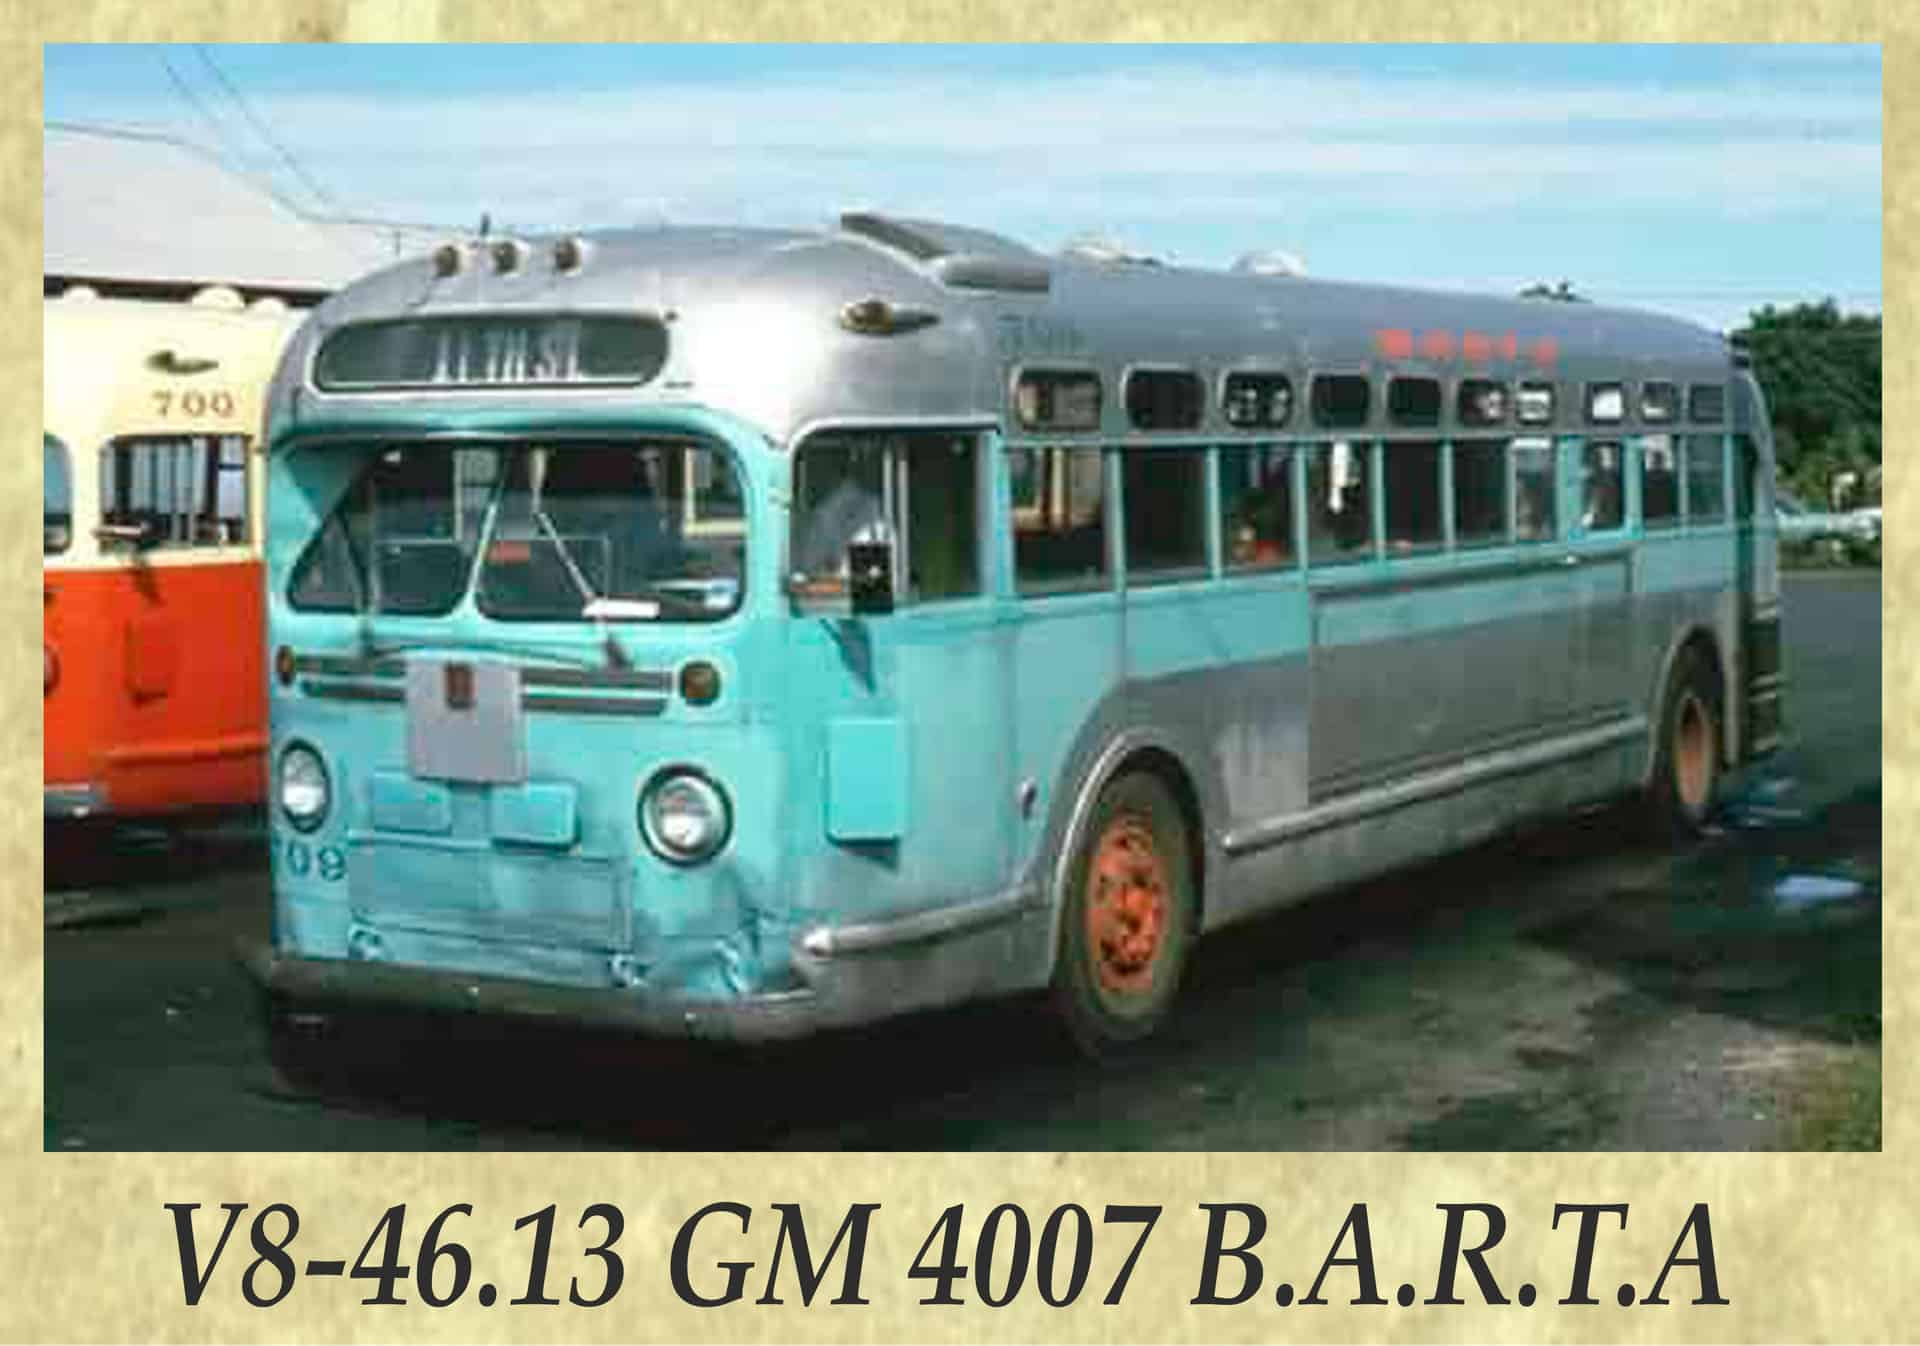 V8-46.13 GM 4007 B.A.R.T